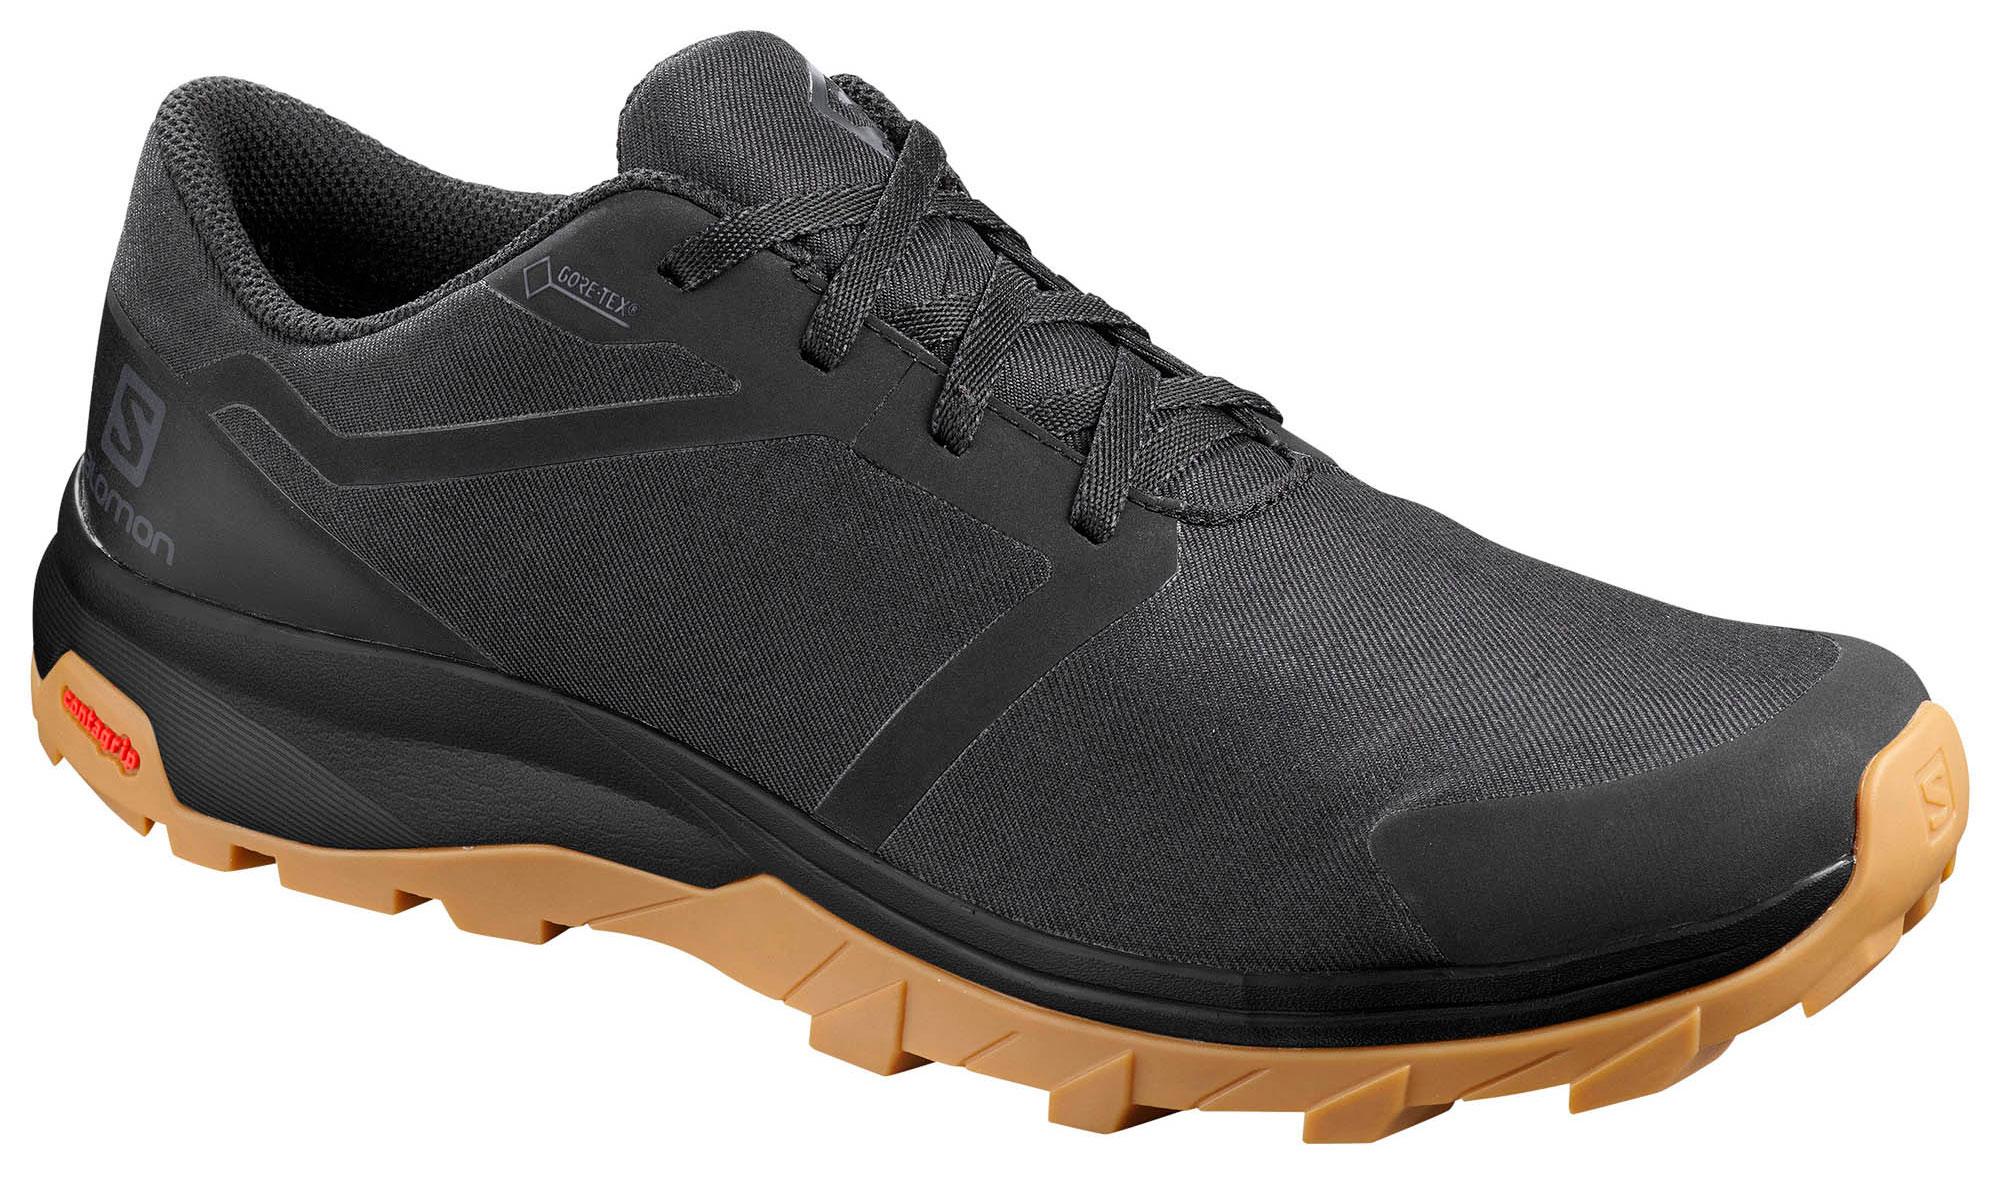 tallas de zapatillas salomon urbanas 60